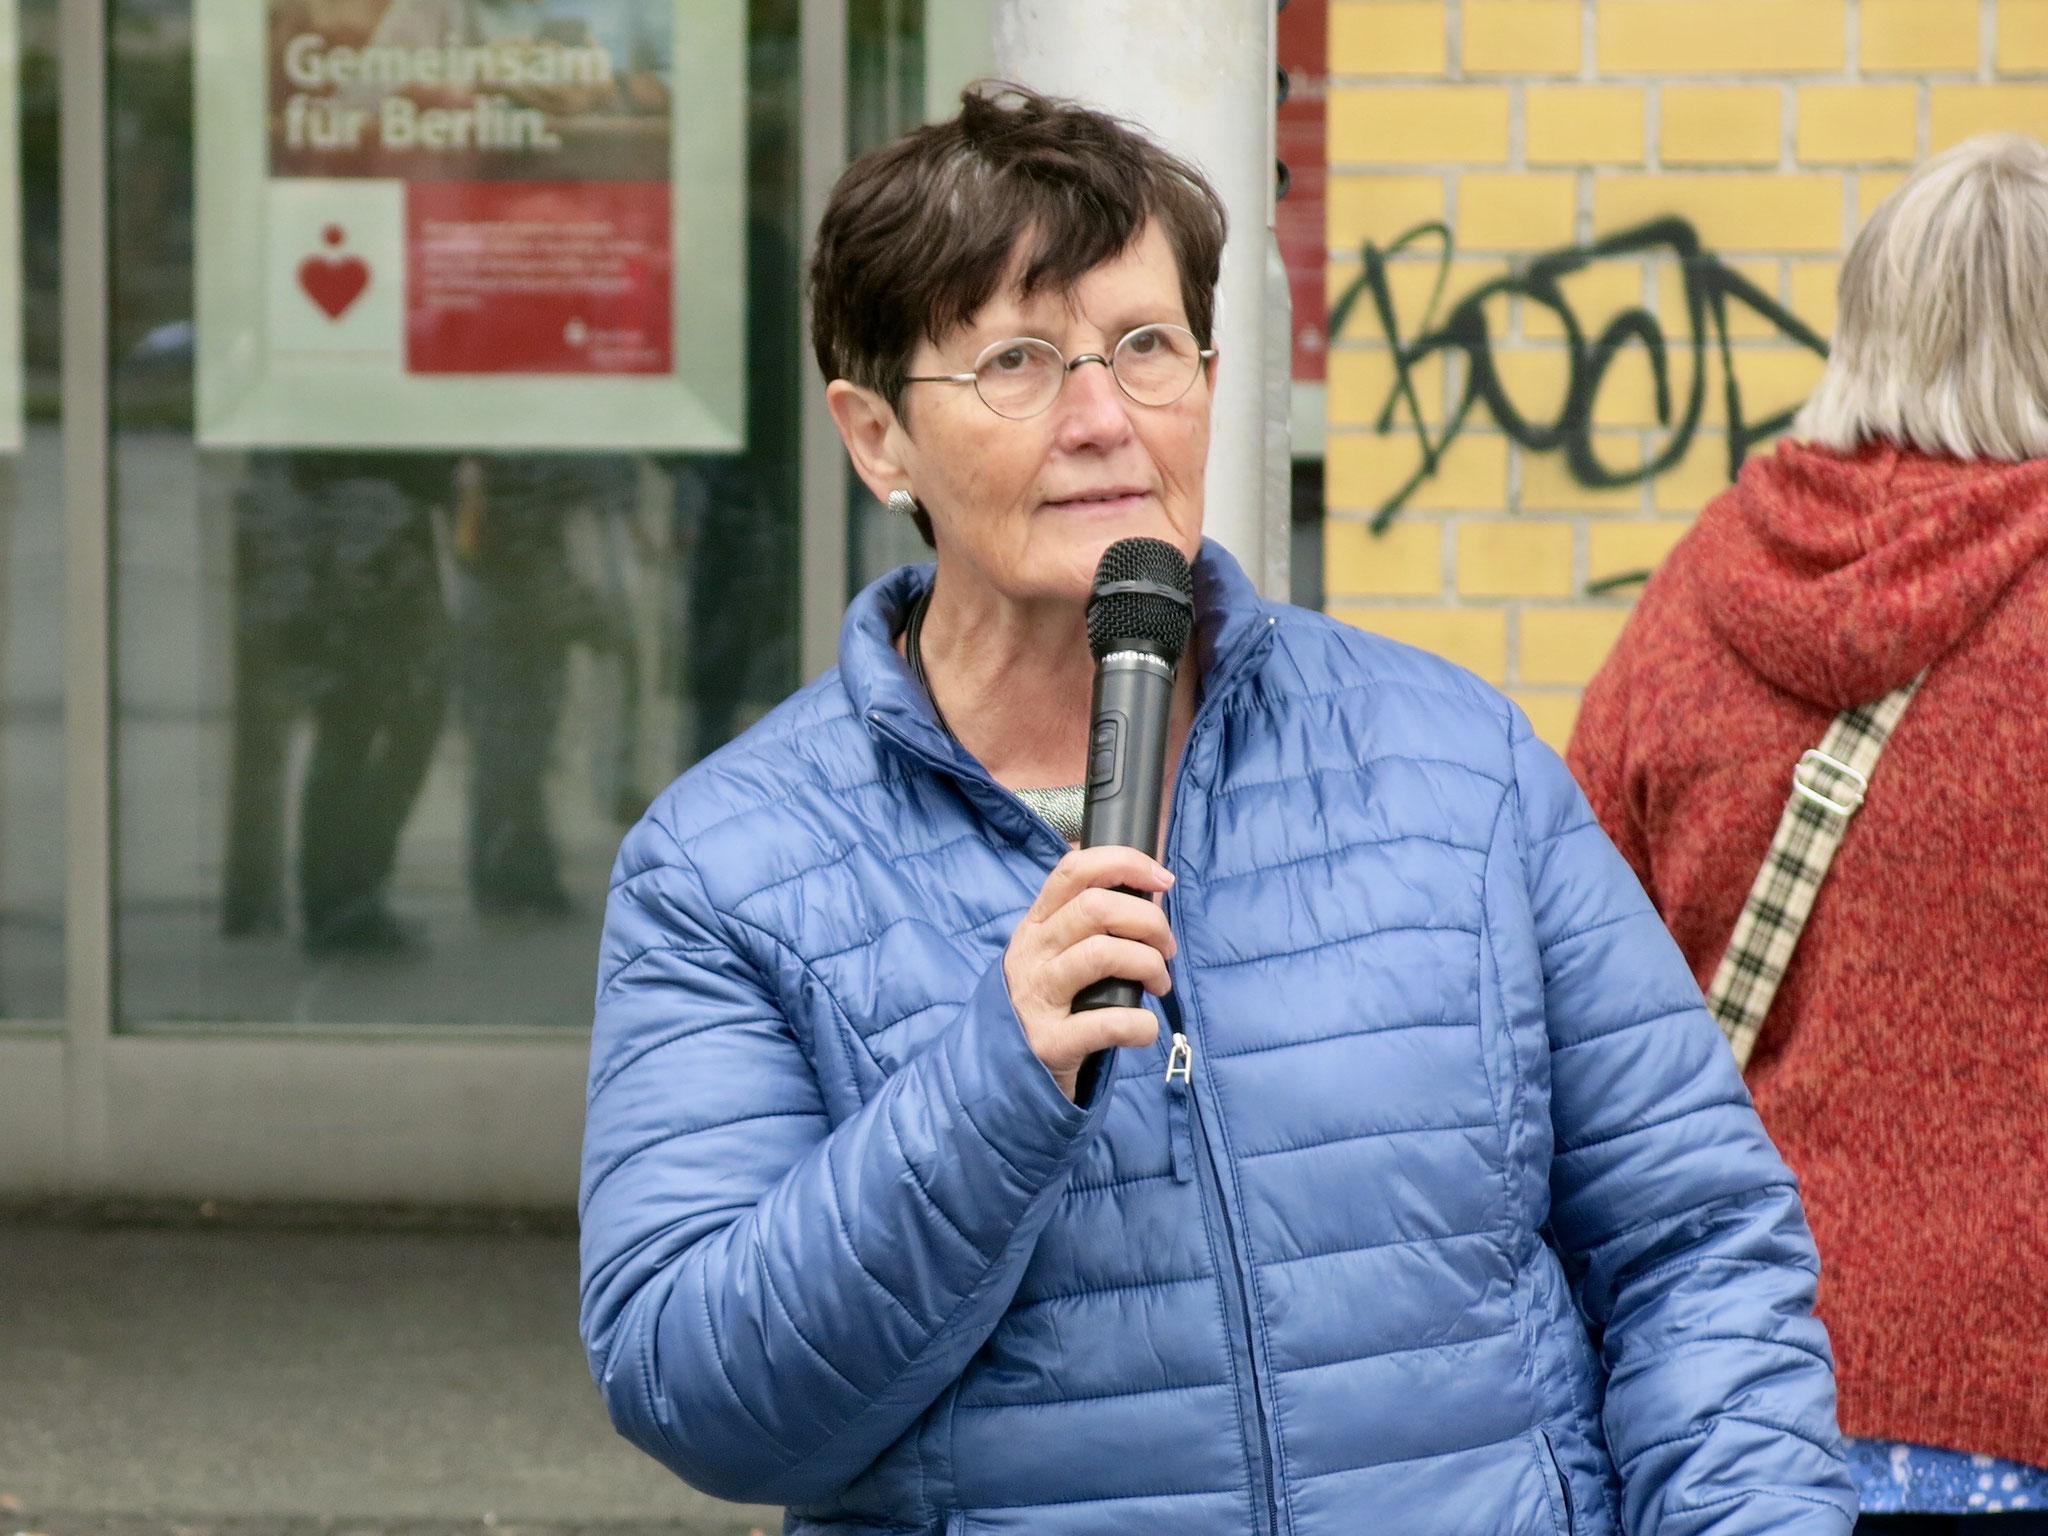 Marzahn-Hellersdorfs Bezirksbürgermeisterin Dagmar Pohle